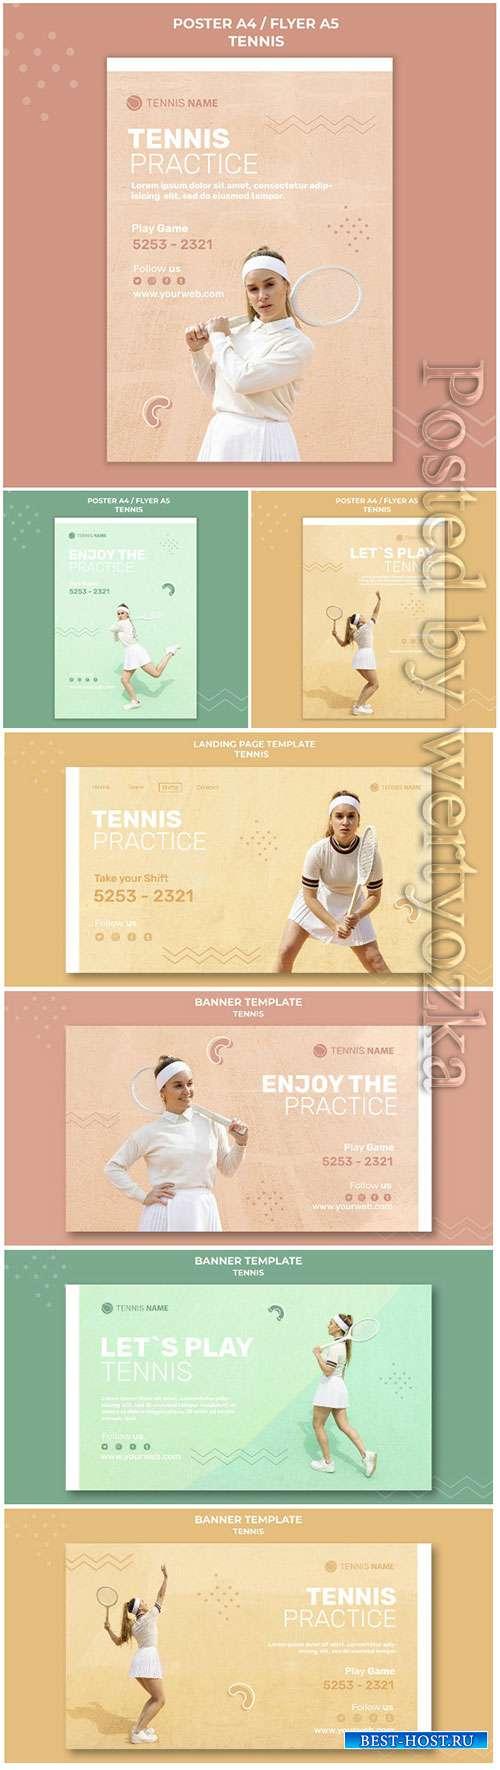 Tennis practice poster template design psd